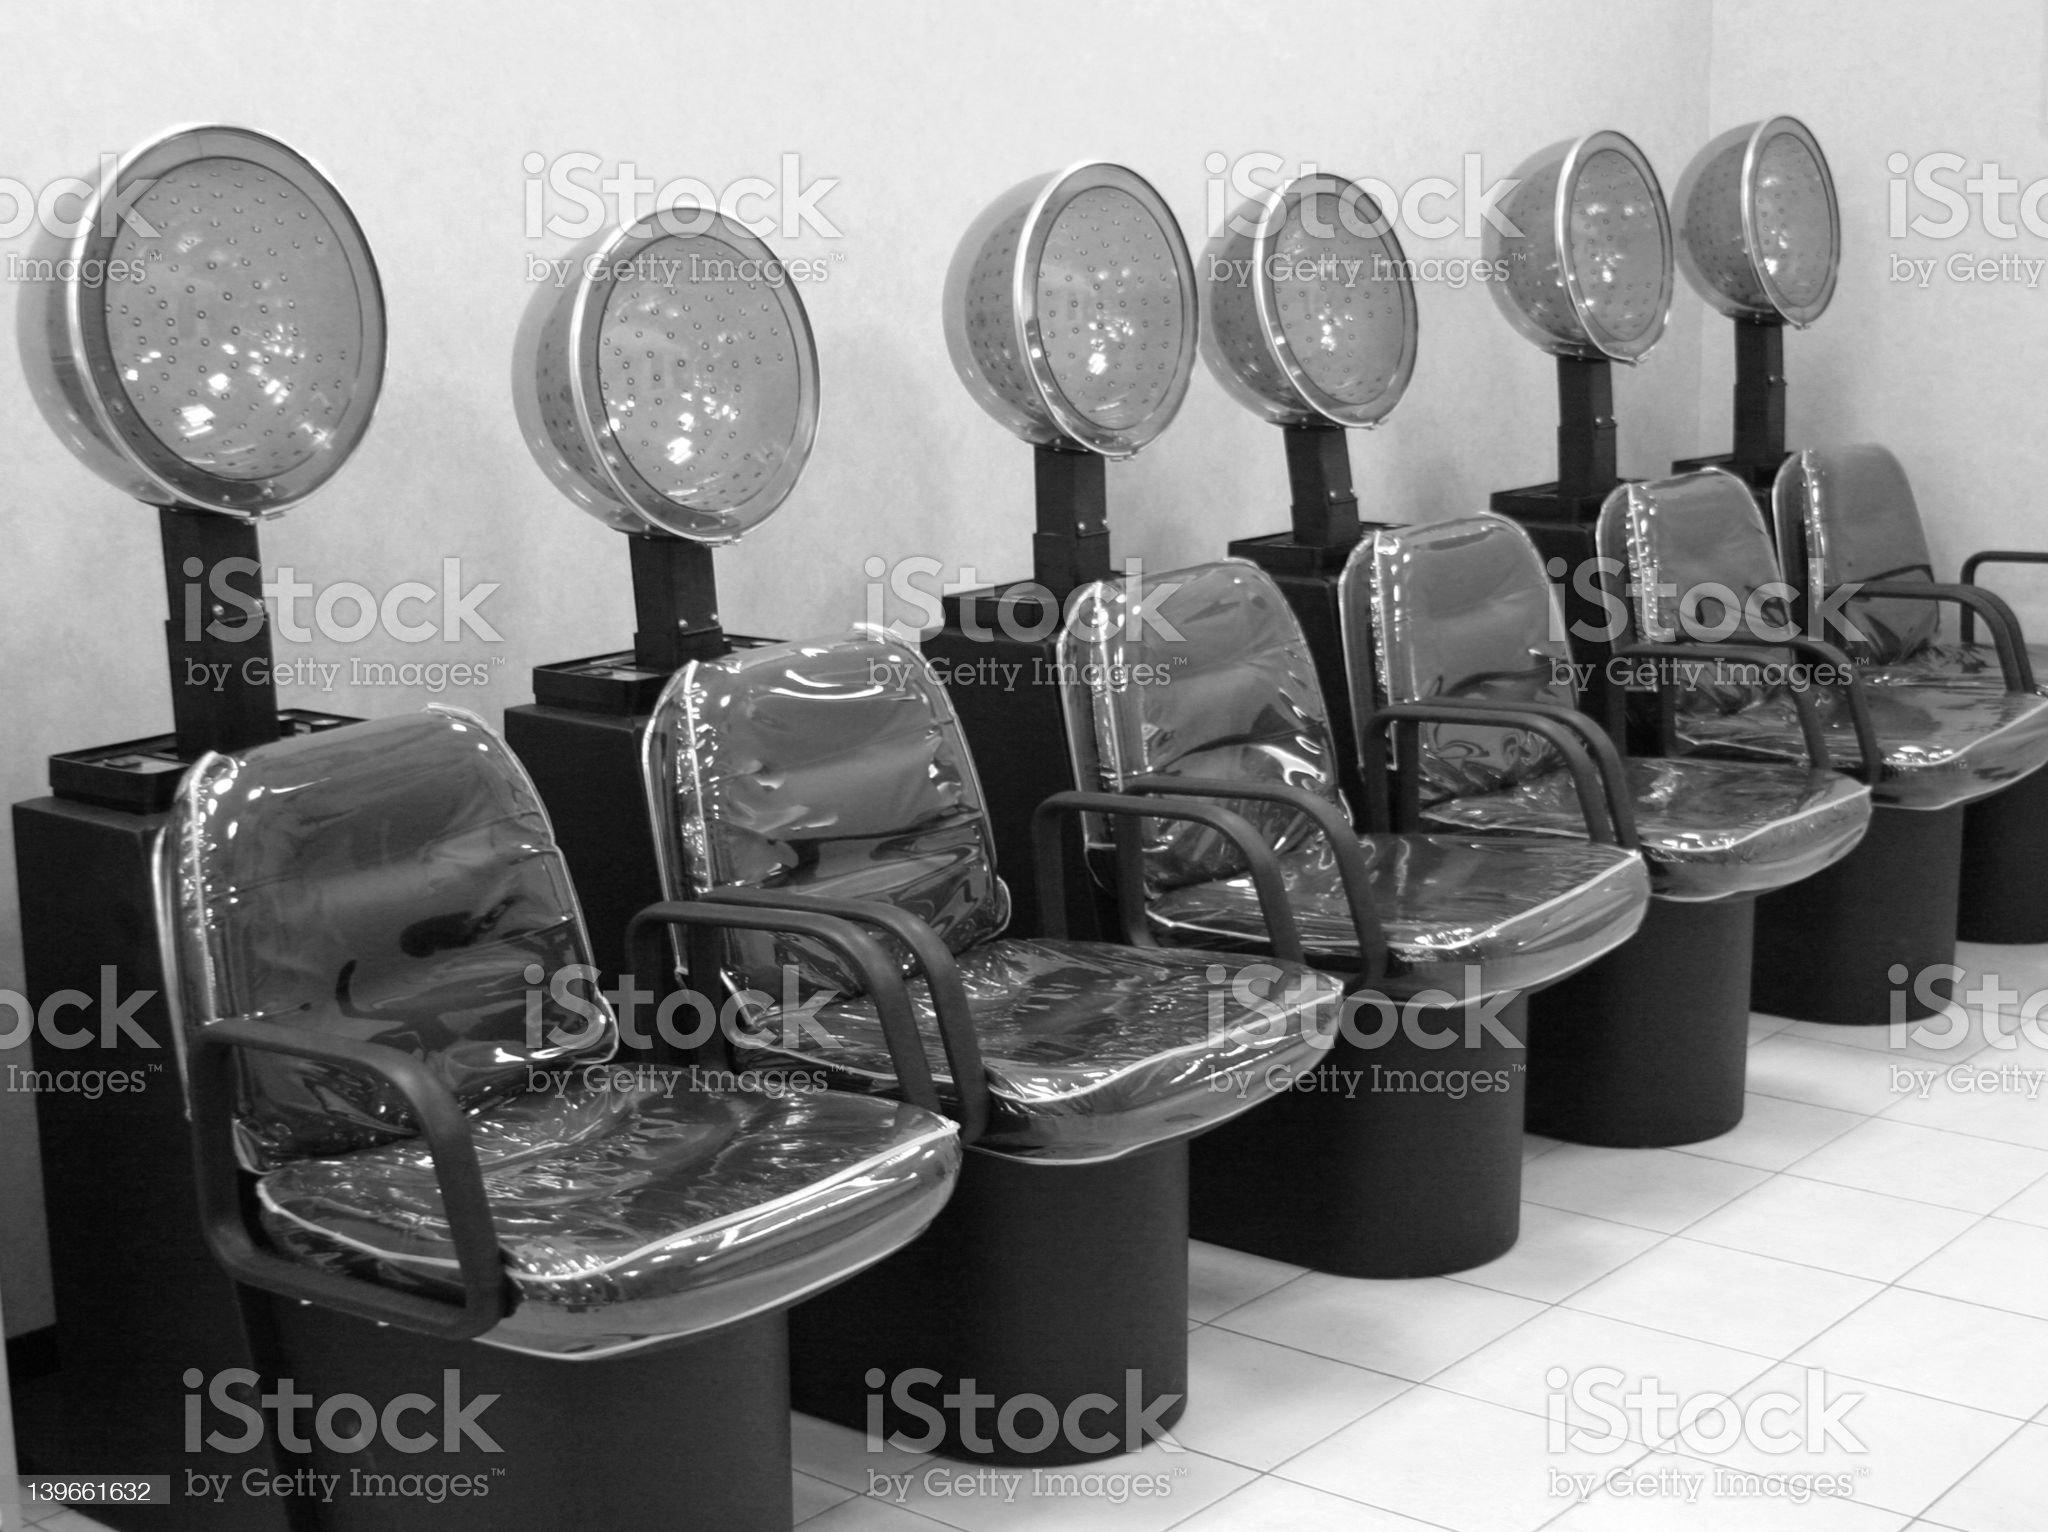 salon hair dryers royalty-free stock photo